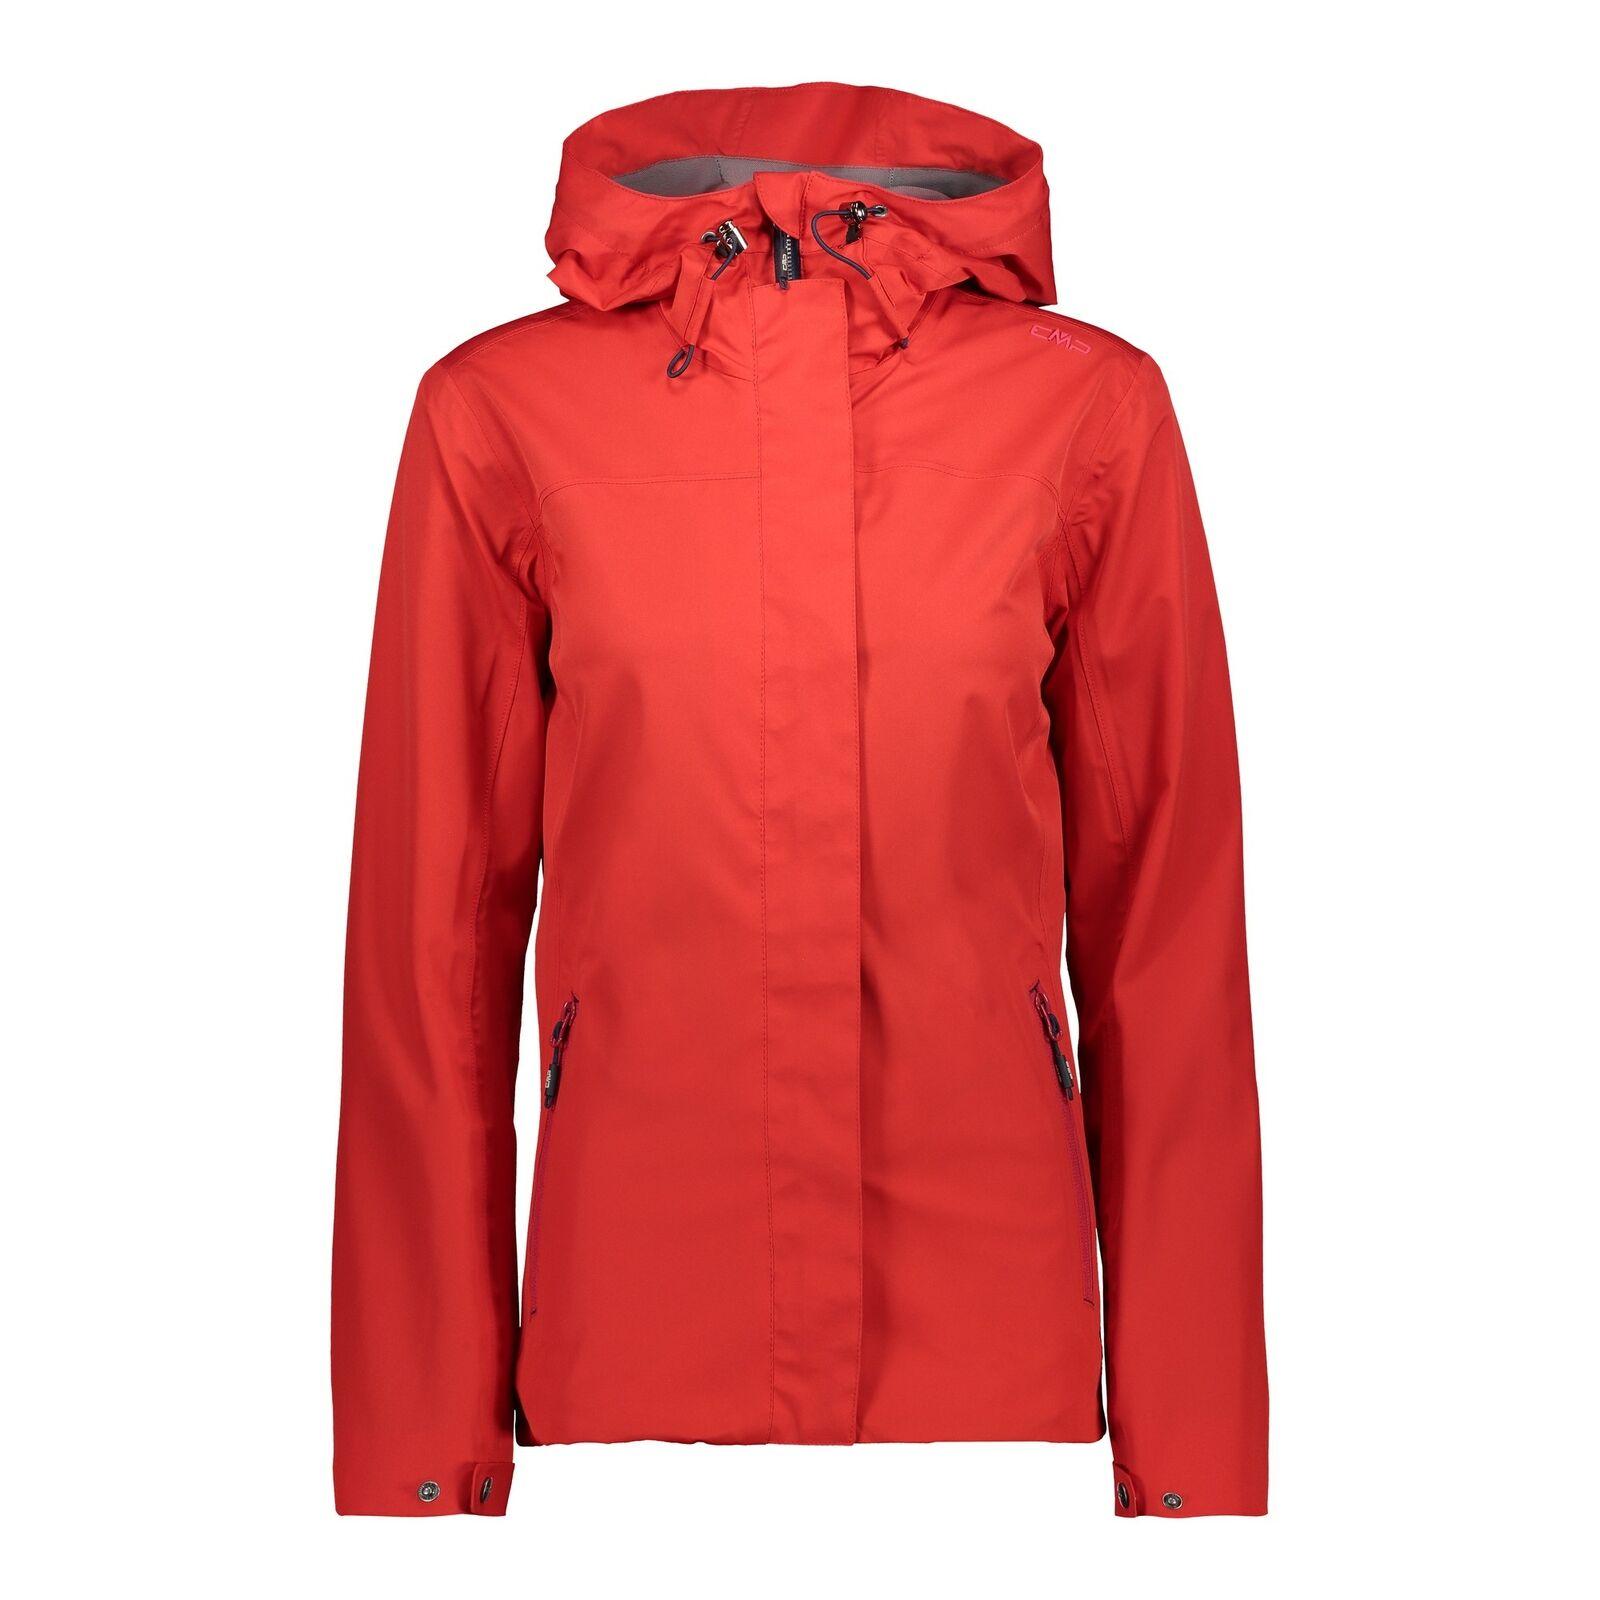 Funzione CMP Giacca Giacca Donna Fix Hood Jacket Rosso Impermeabile Traspirante